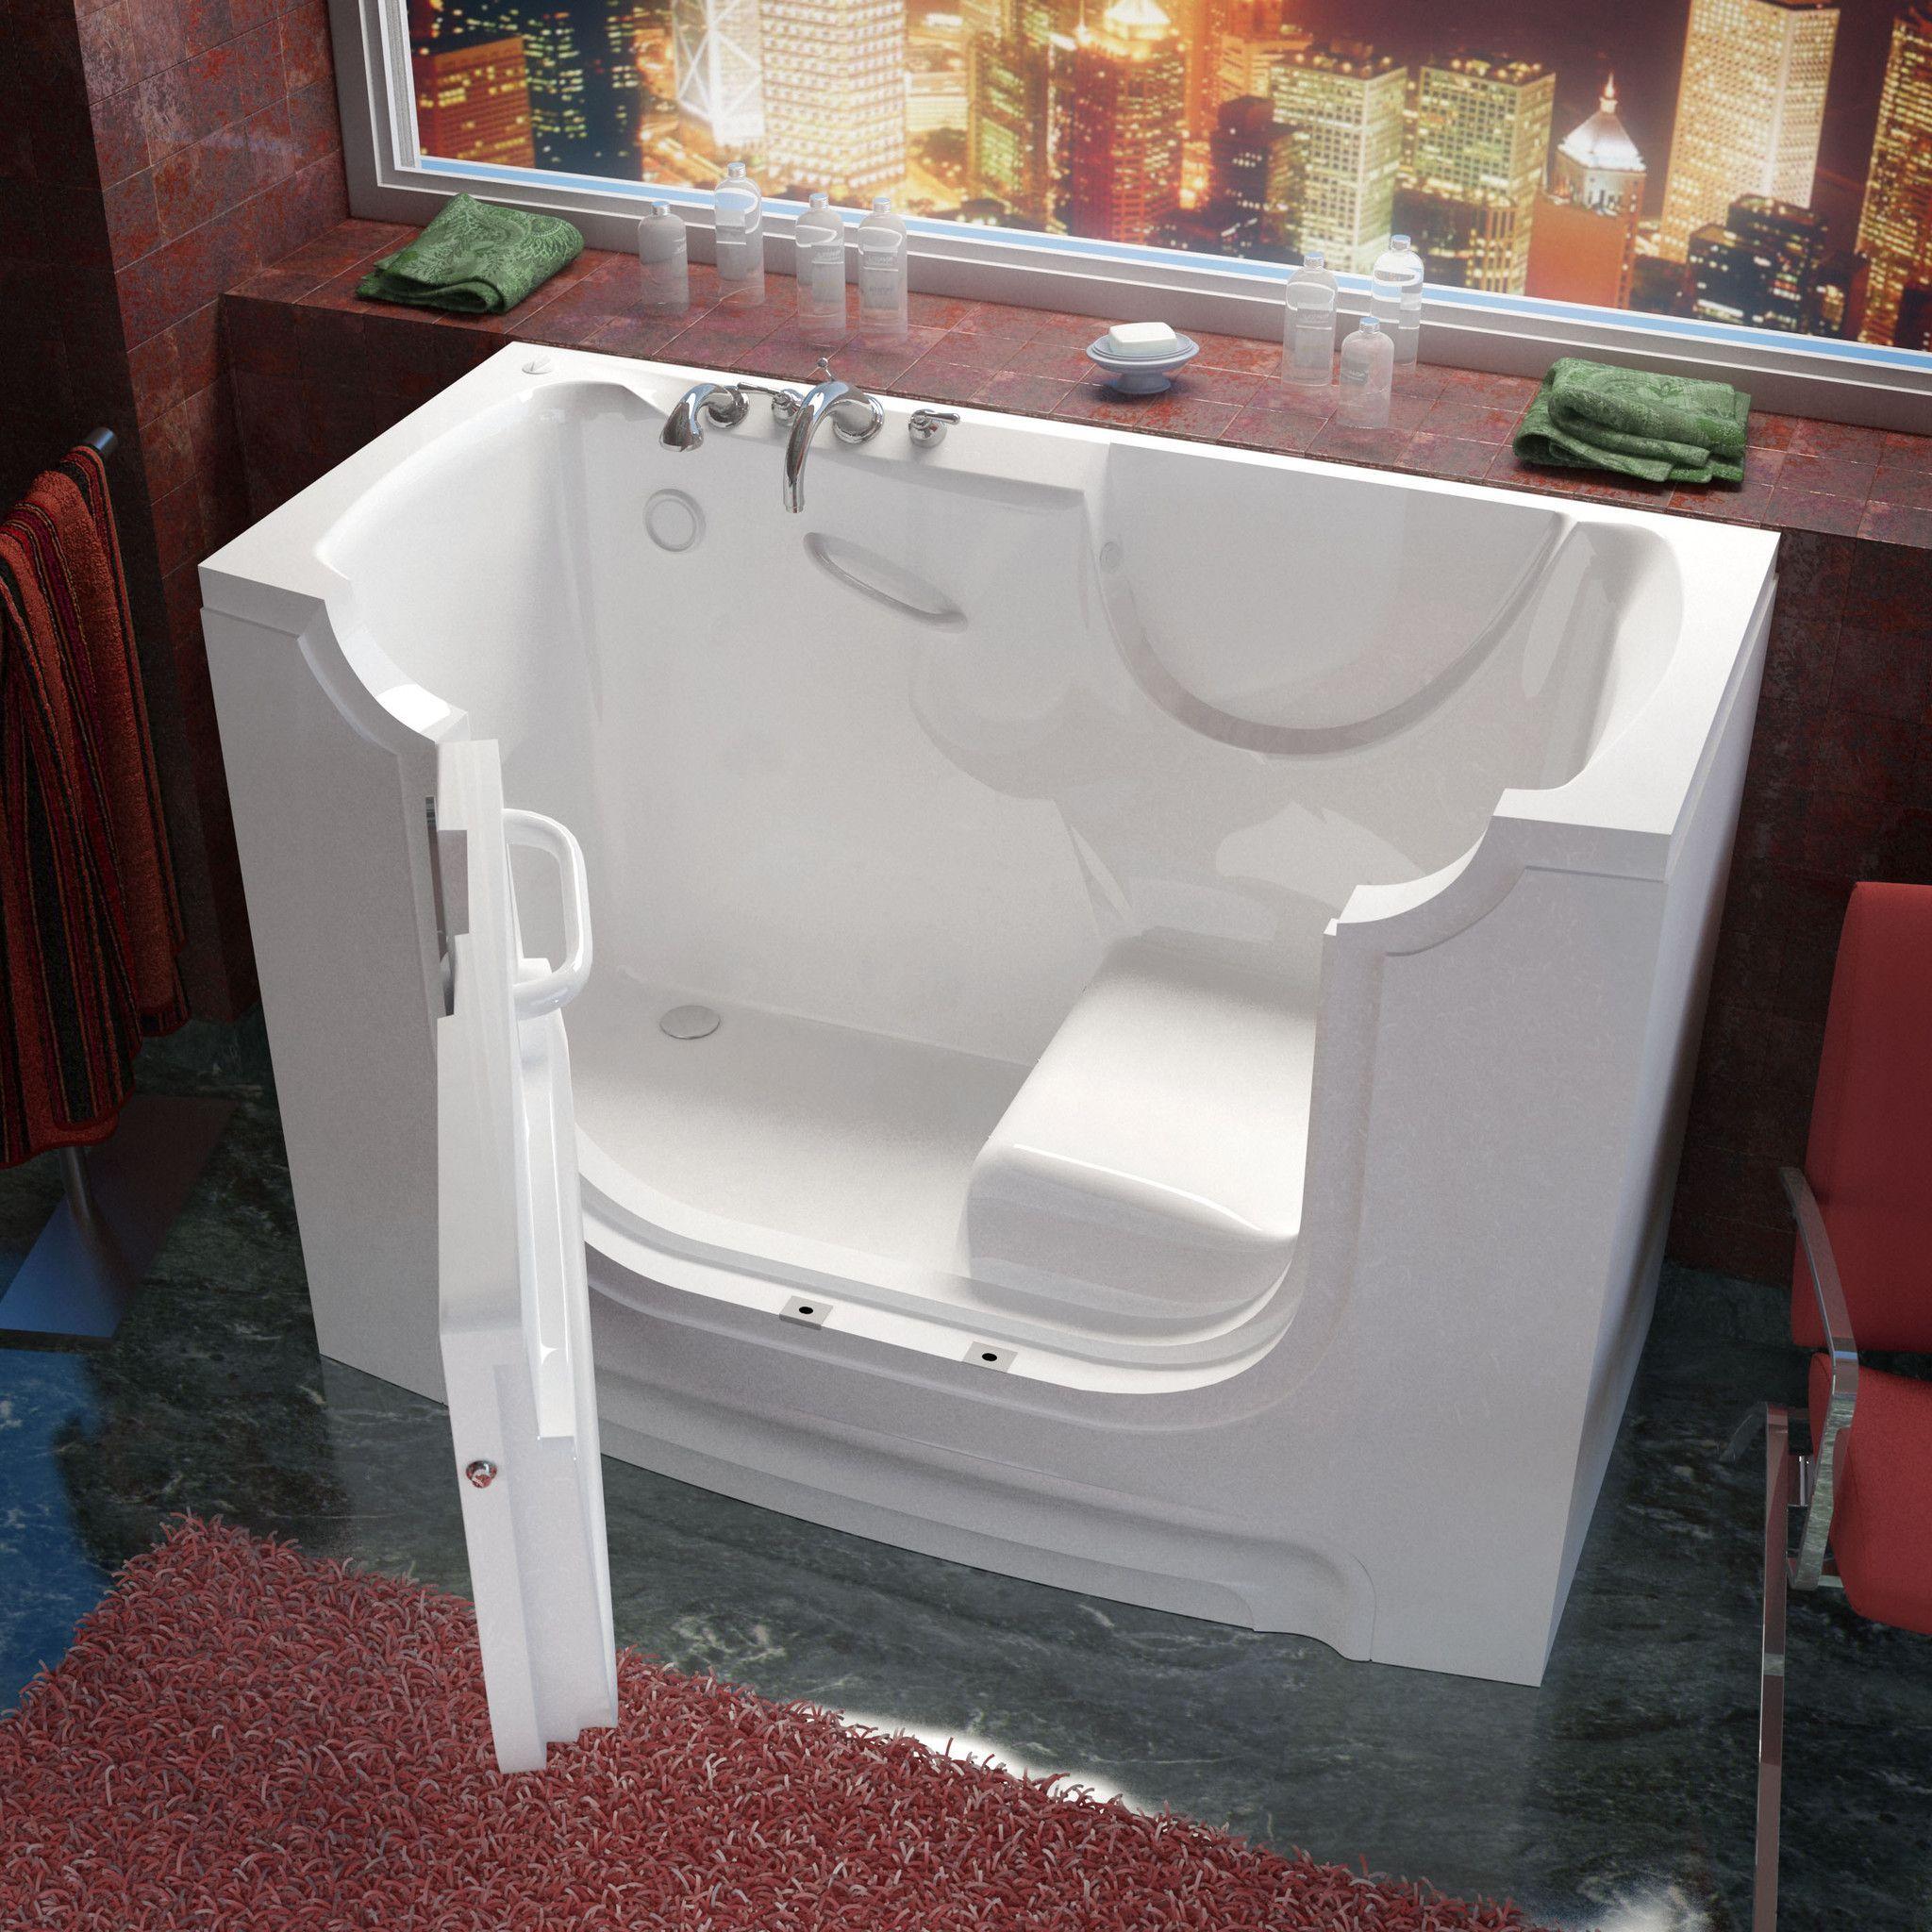 Venzi VZ3060WCALWS 30x60 Left Drain White Soaking Wheelchair ...